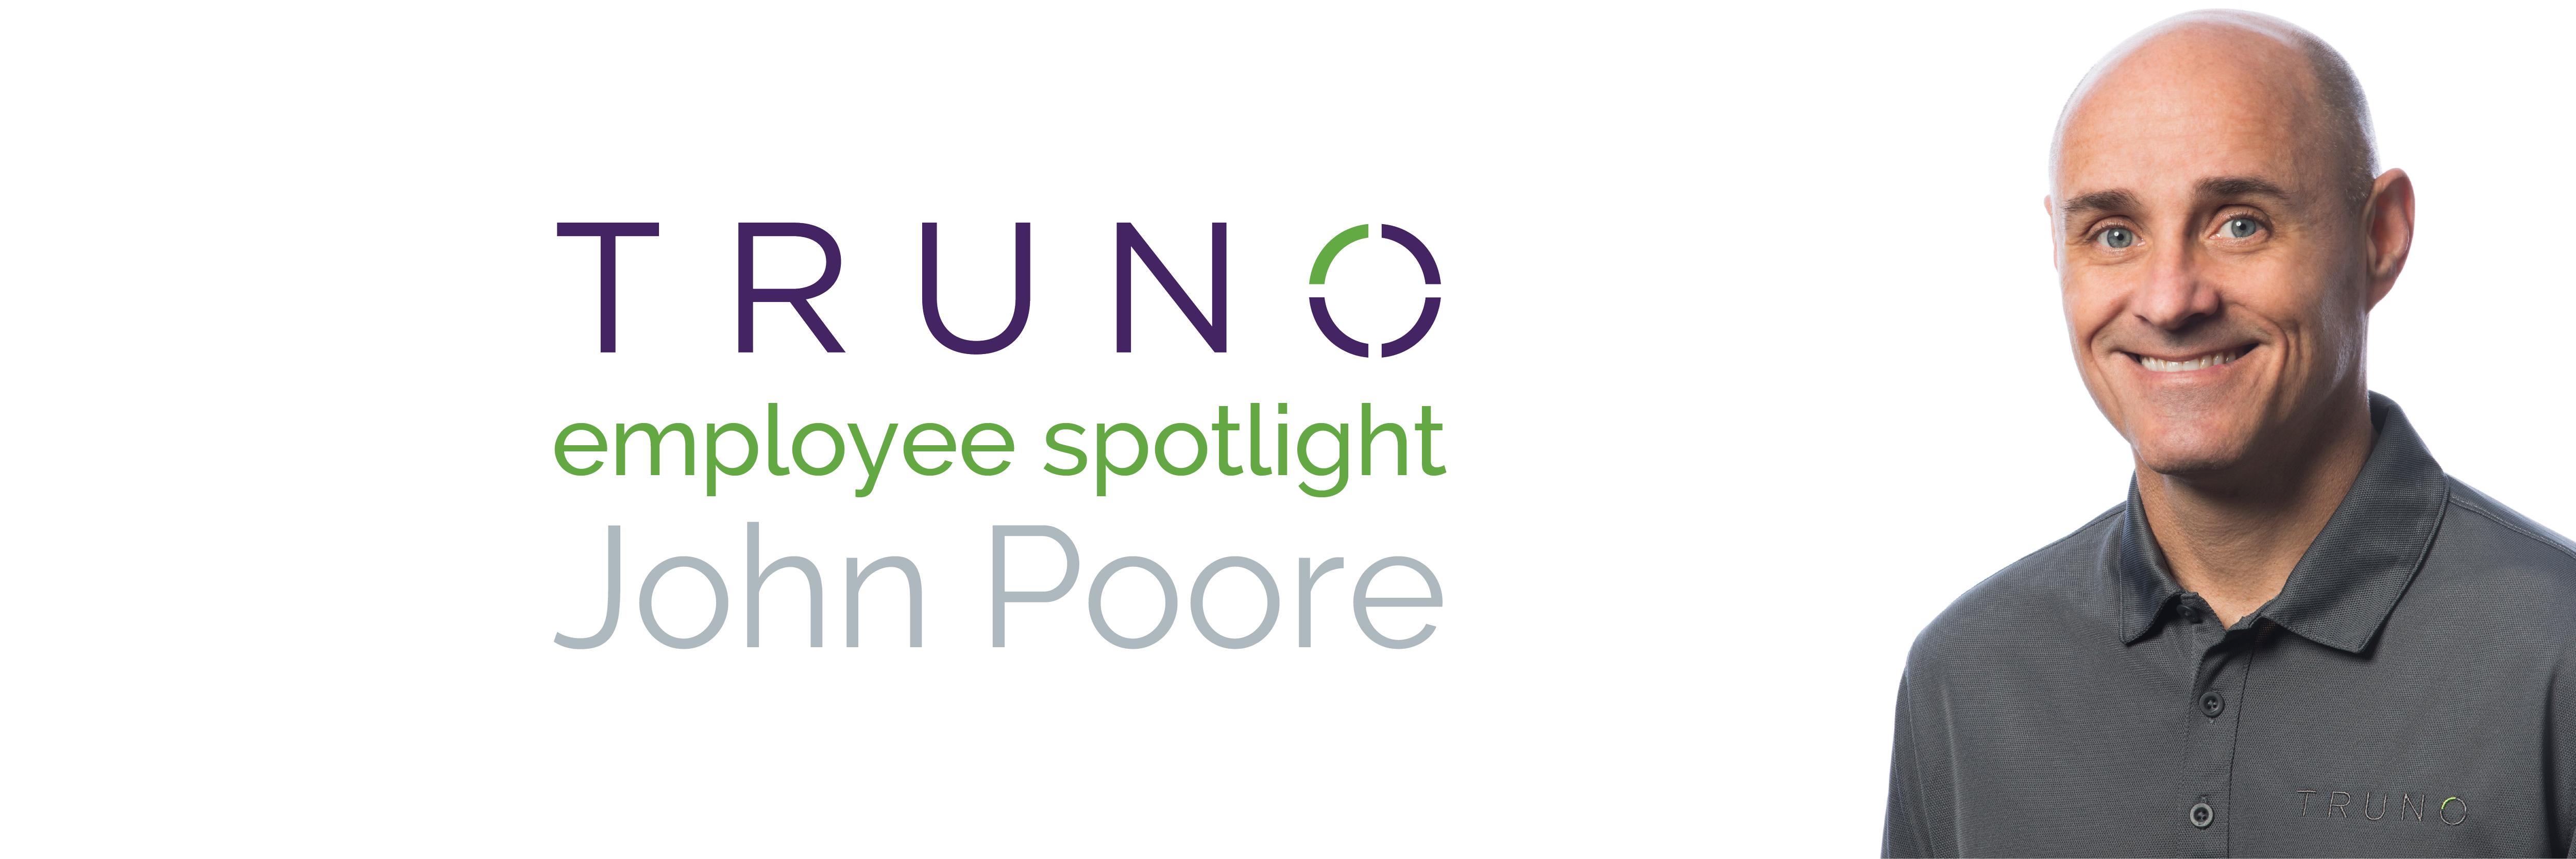 TRUNO Employee Spotlight: John Poore